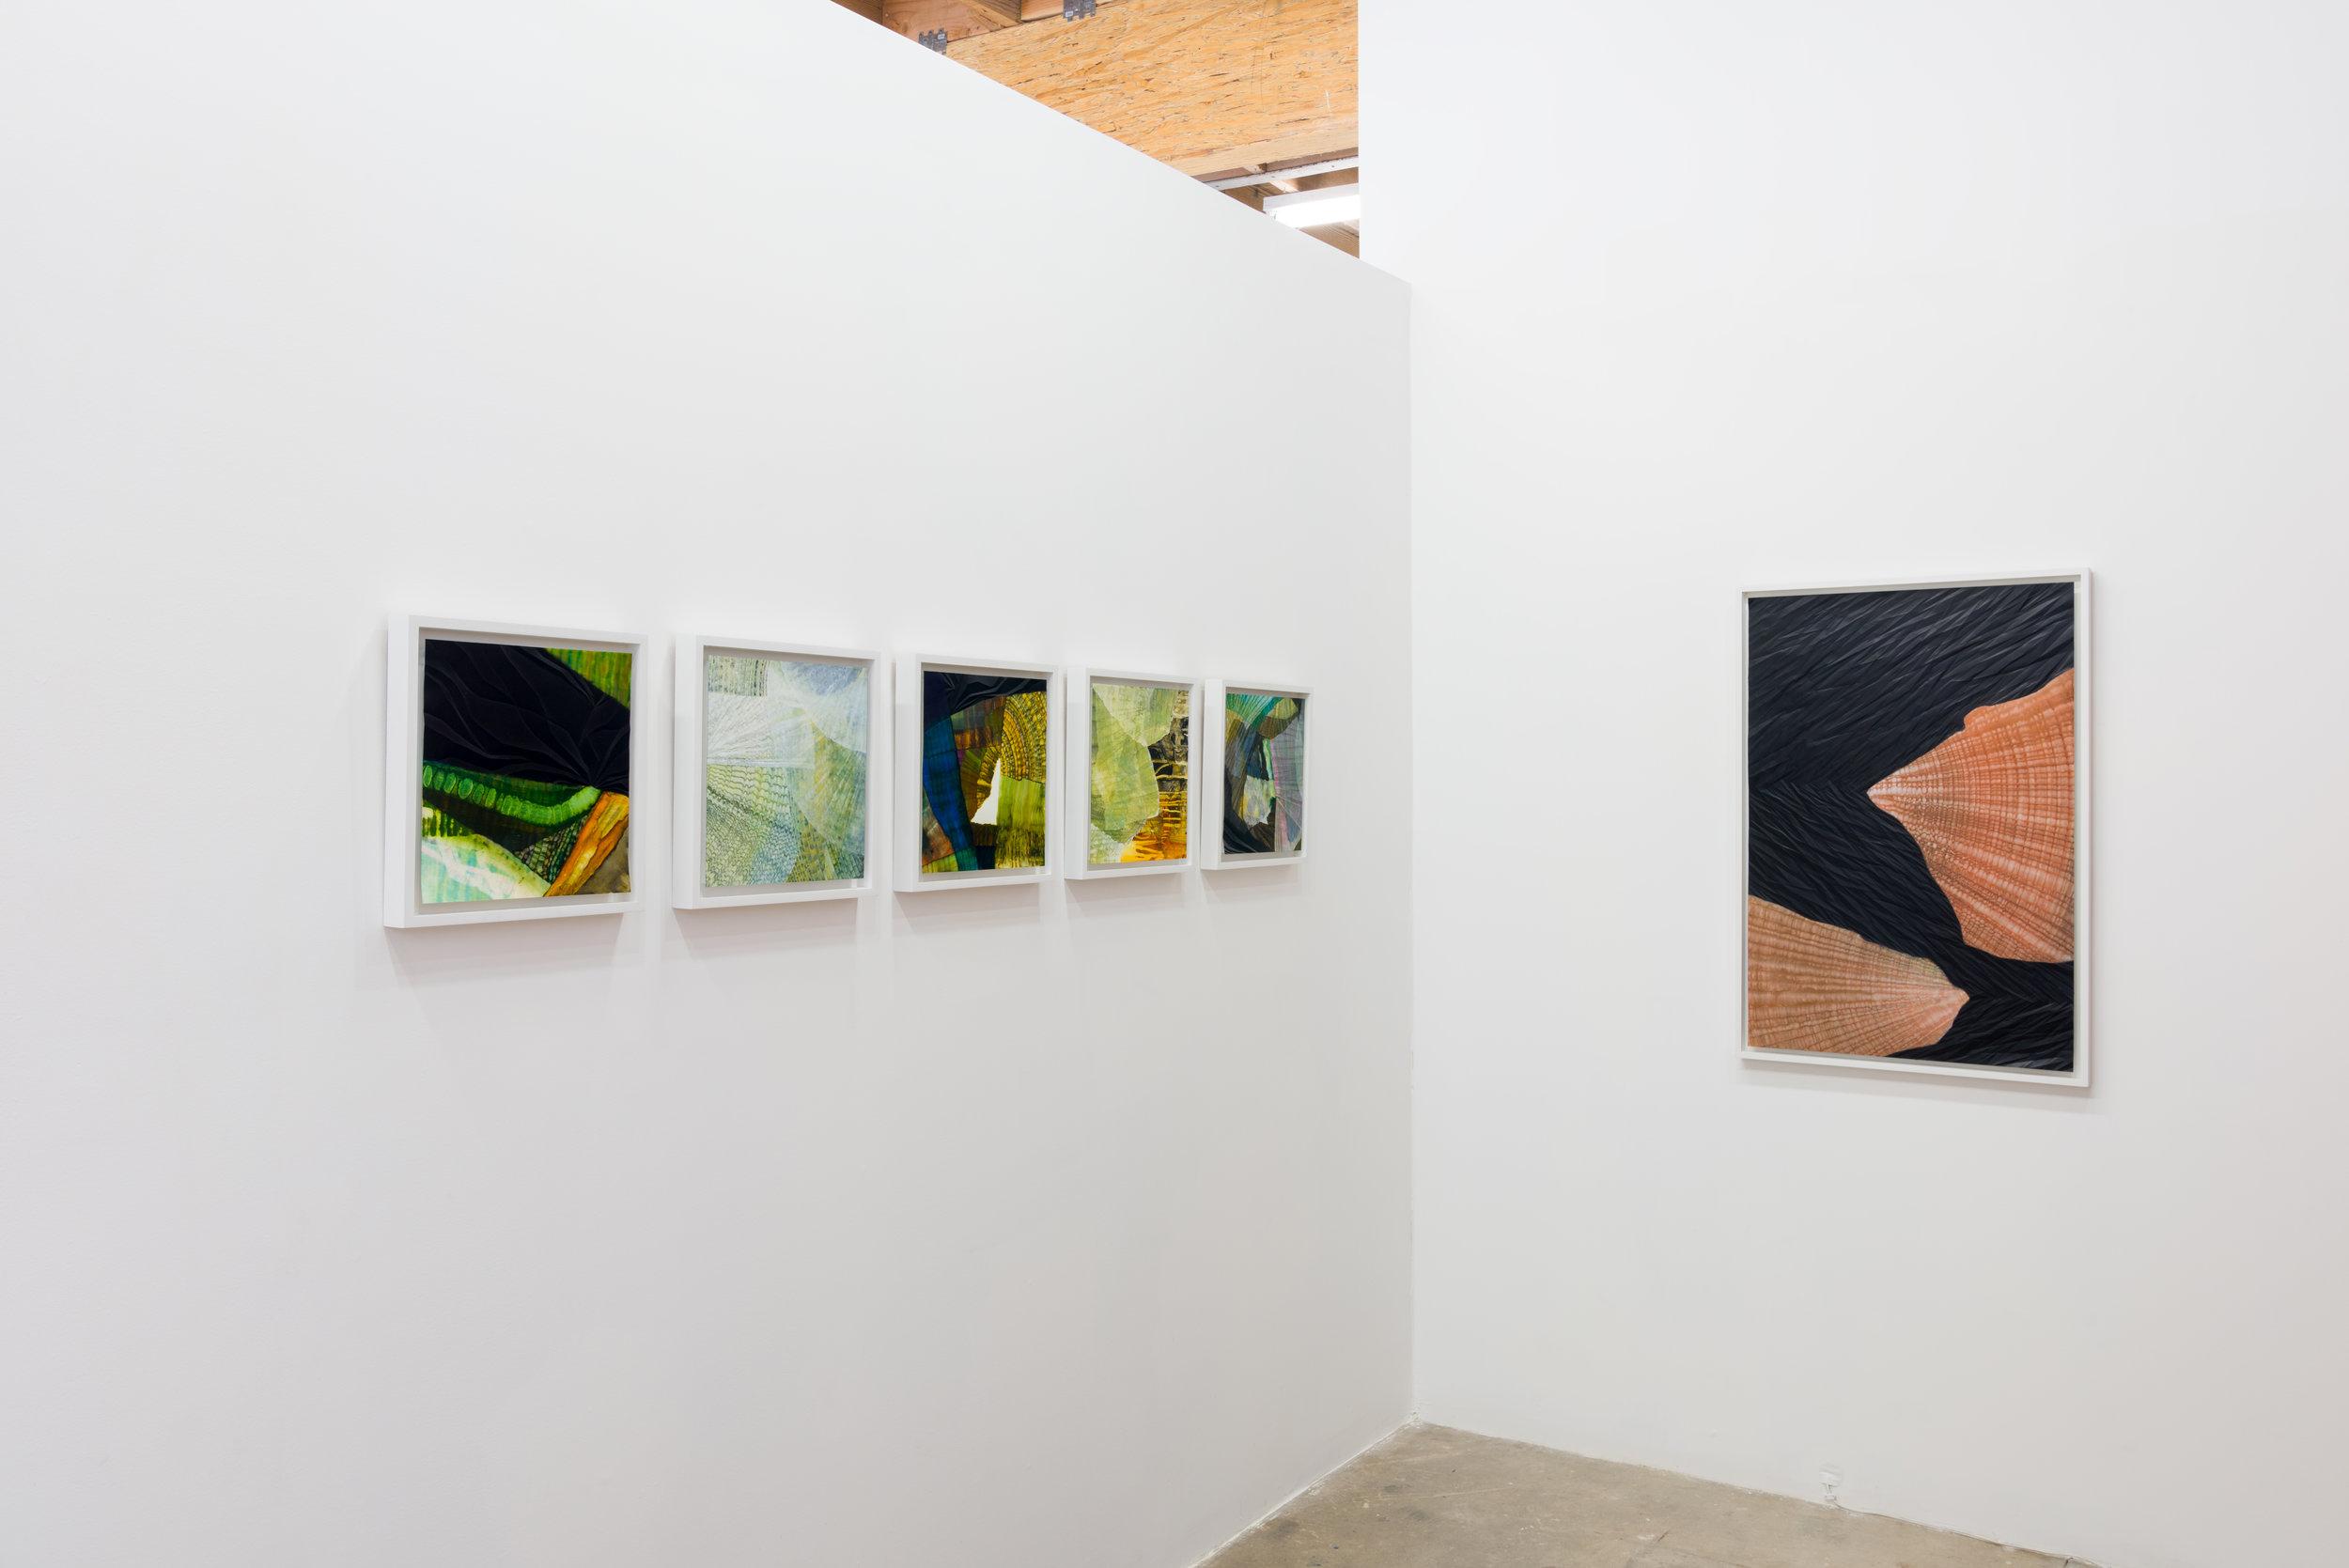 Sandeep Mukherjee,  New Work , 2016. Installation view, Chimento Contemporary. Photo: Ruben Diaz